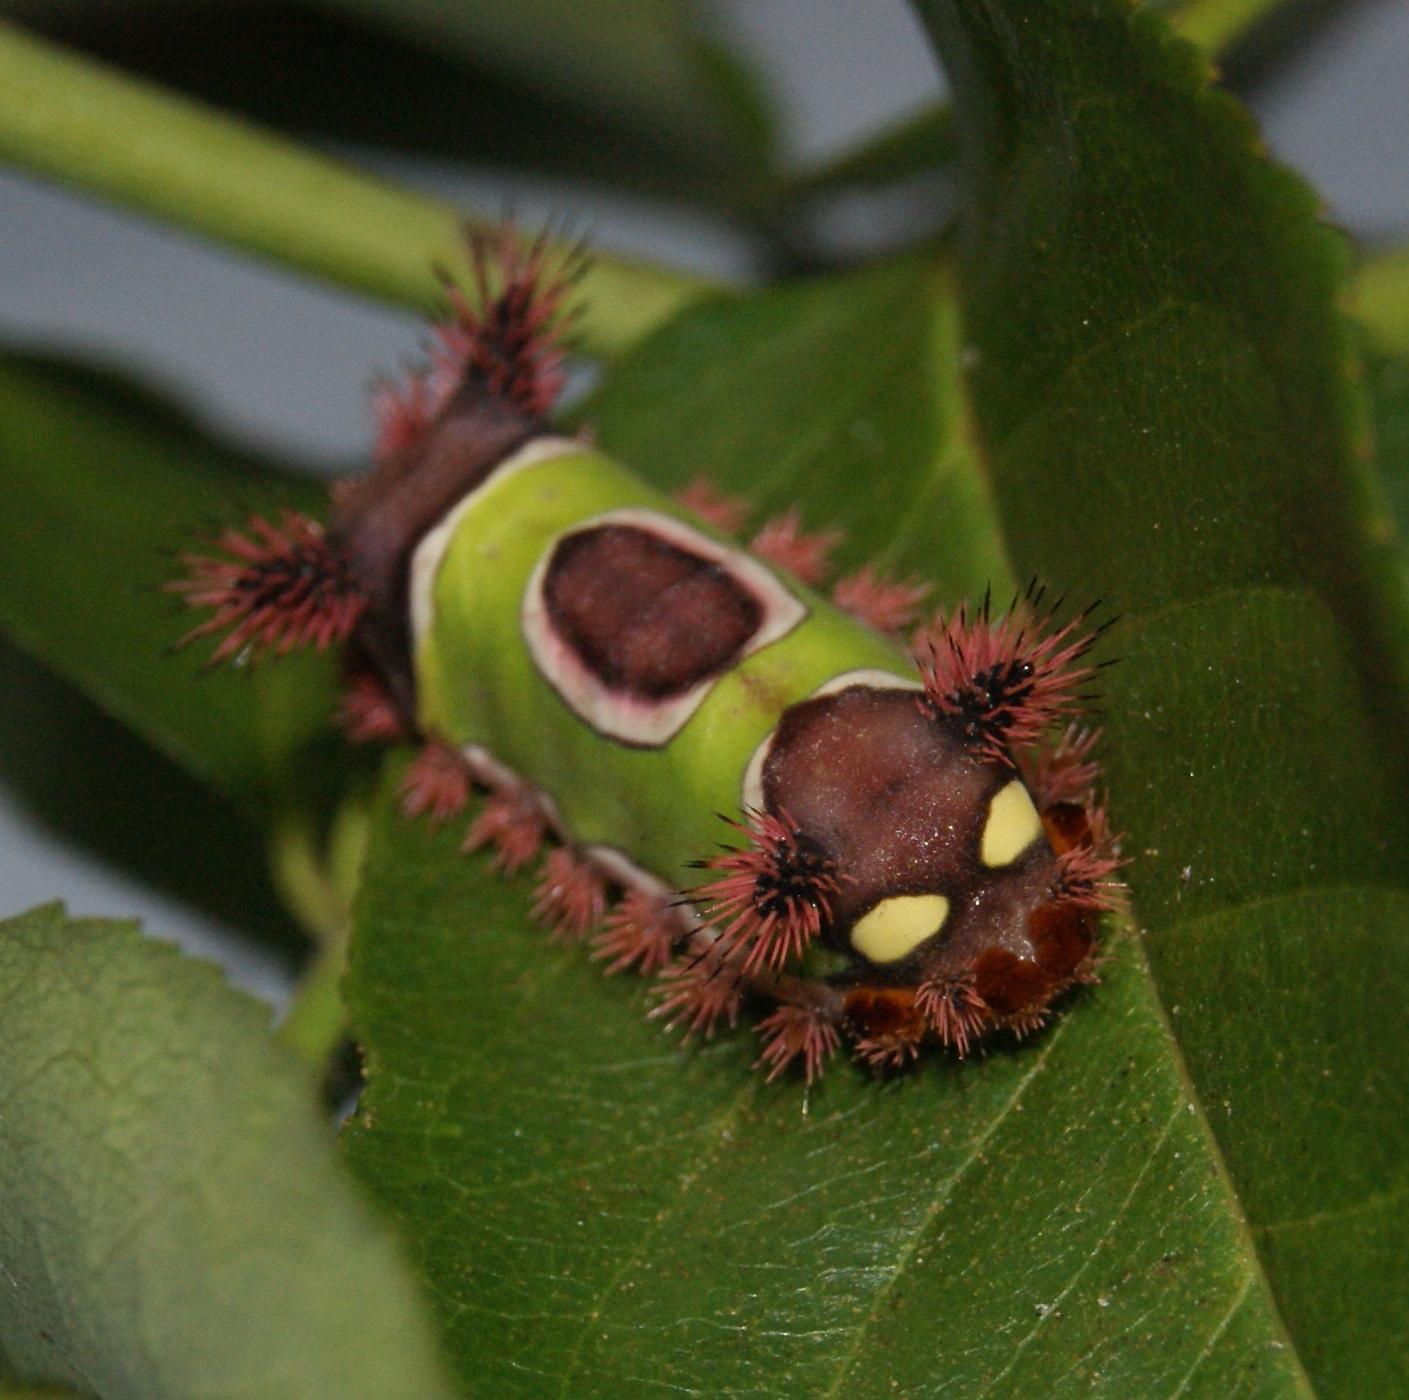 Saddleback Caterpillar, Acharia stimulea. Image Credit Matthew Orwat